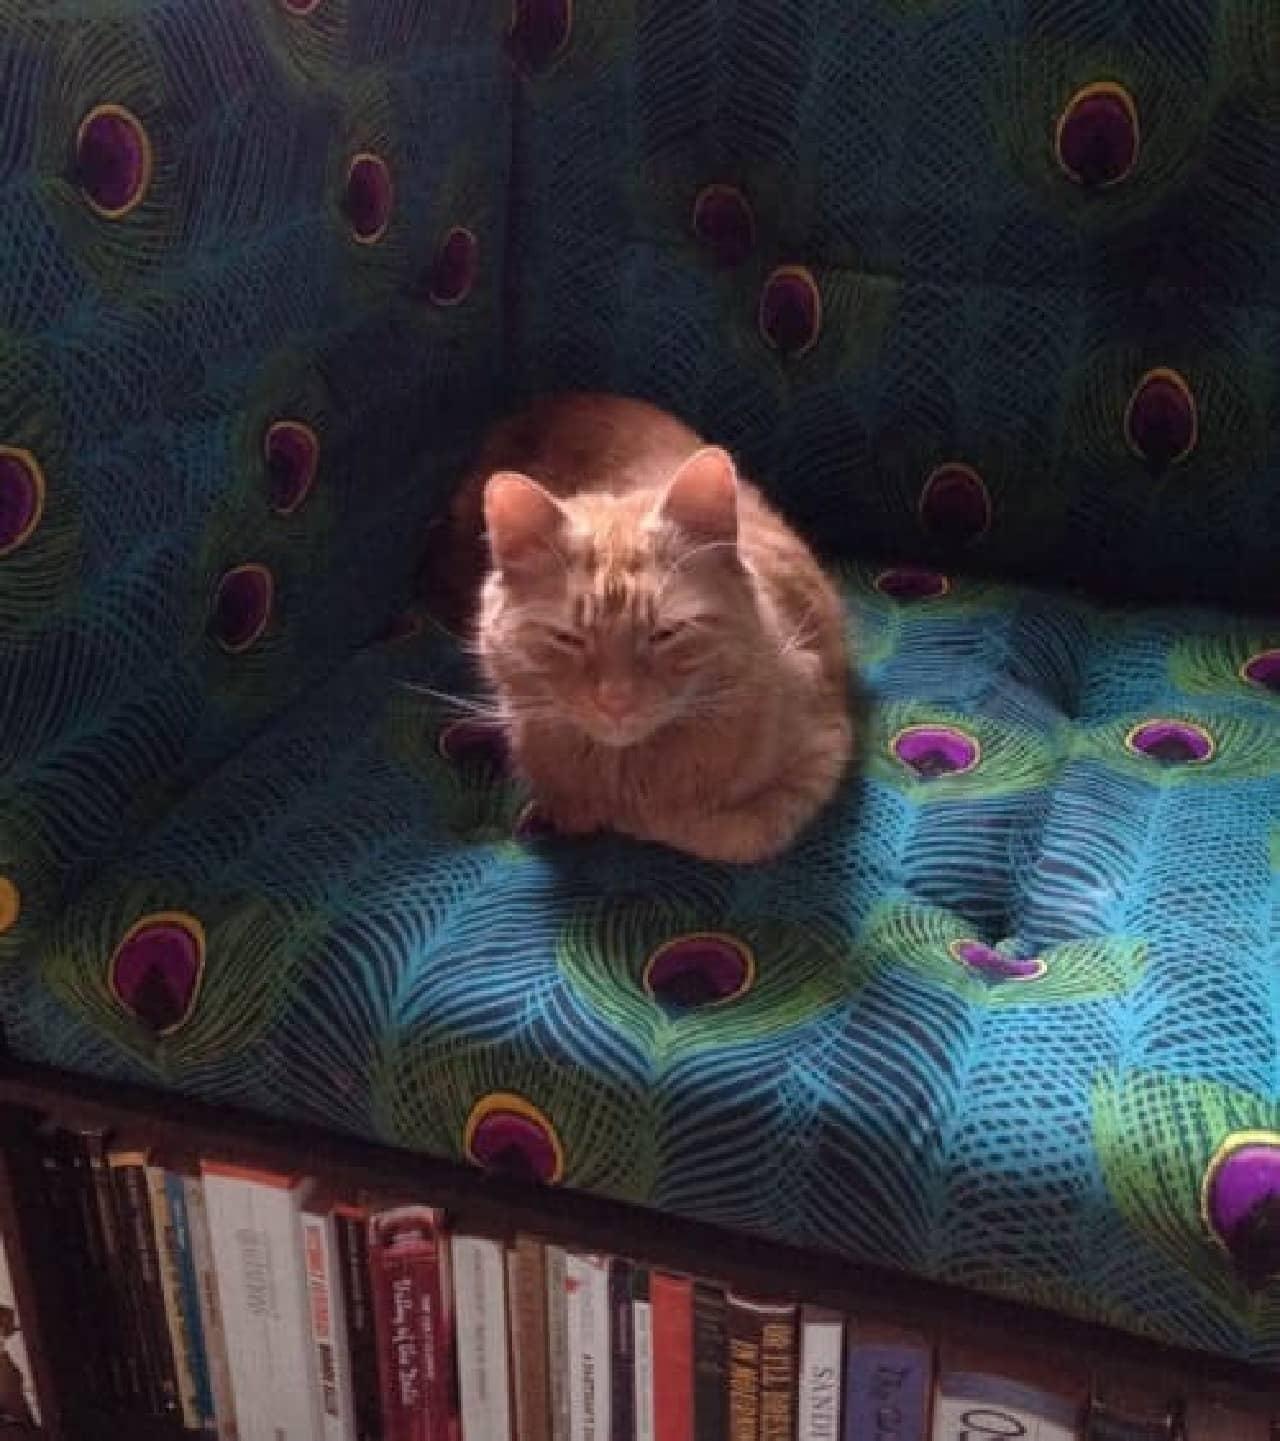 The Love Shack に展示された「The Library Chair」と、店の看板ネコさん